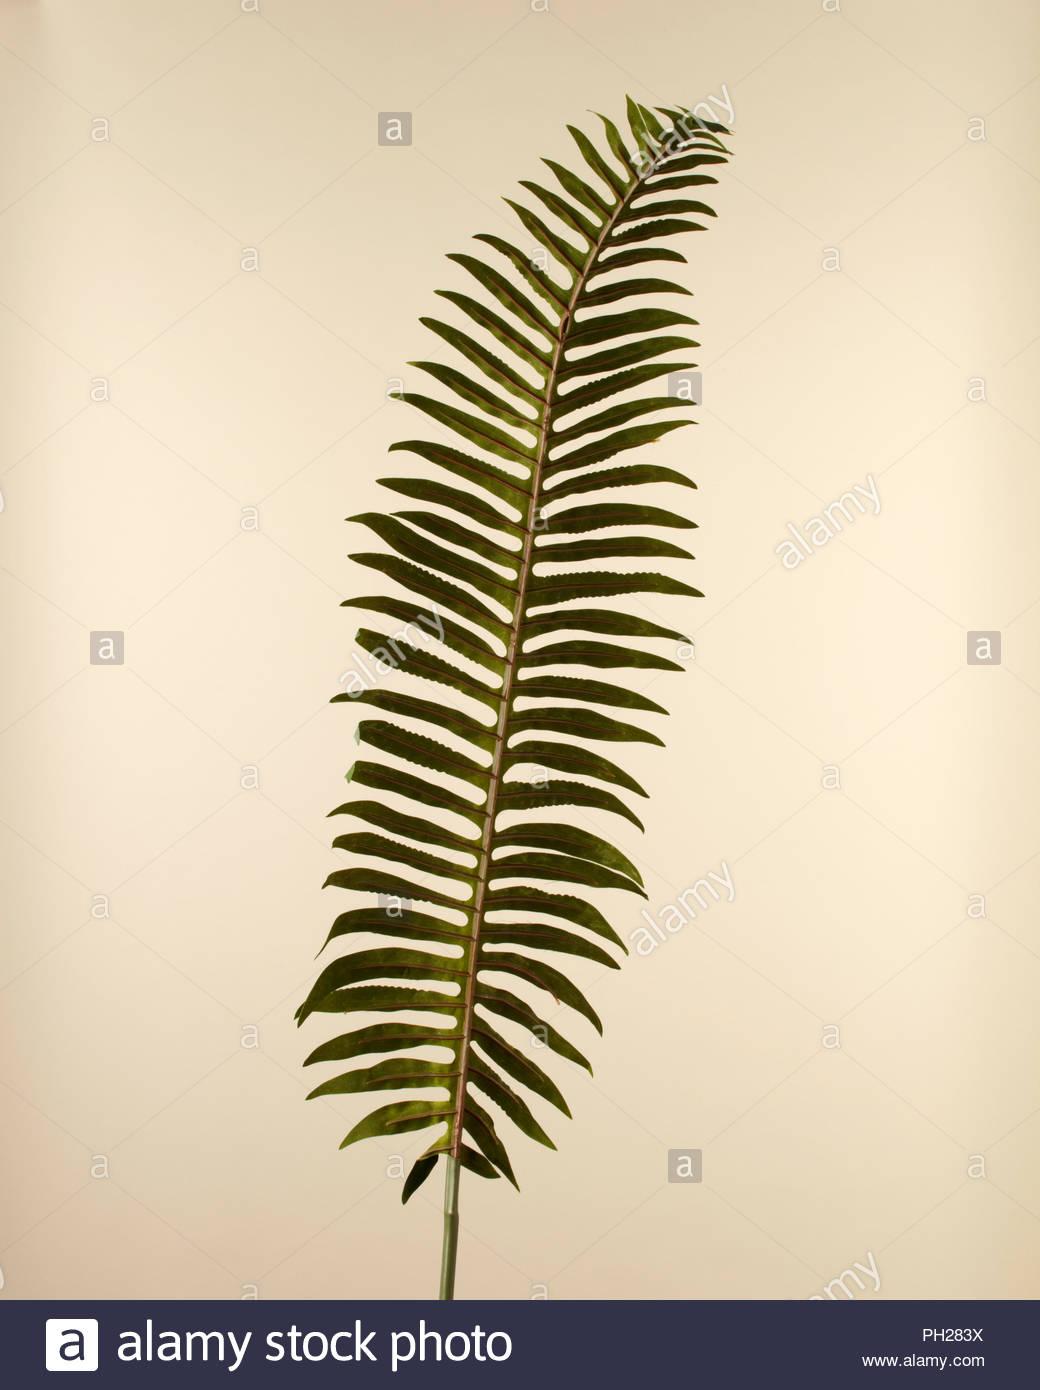 Fern leaf - Stock Image